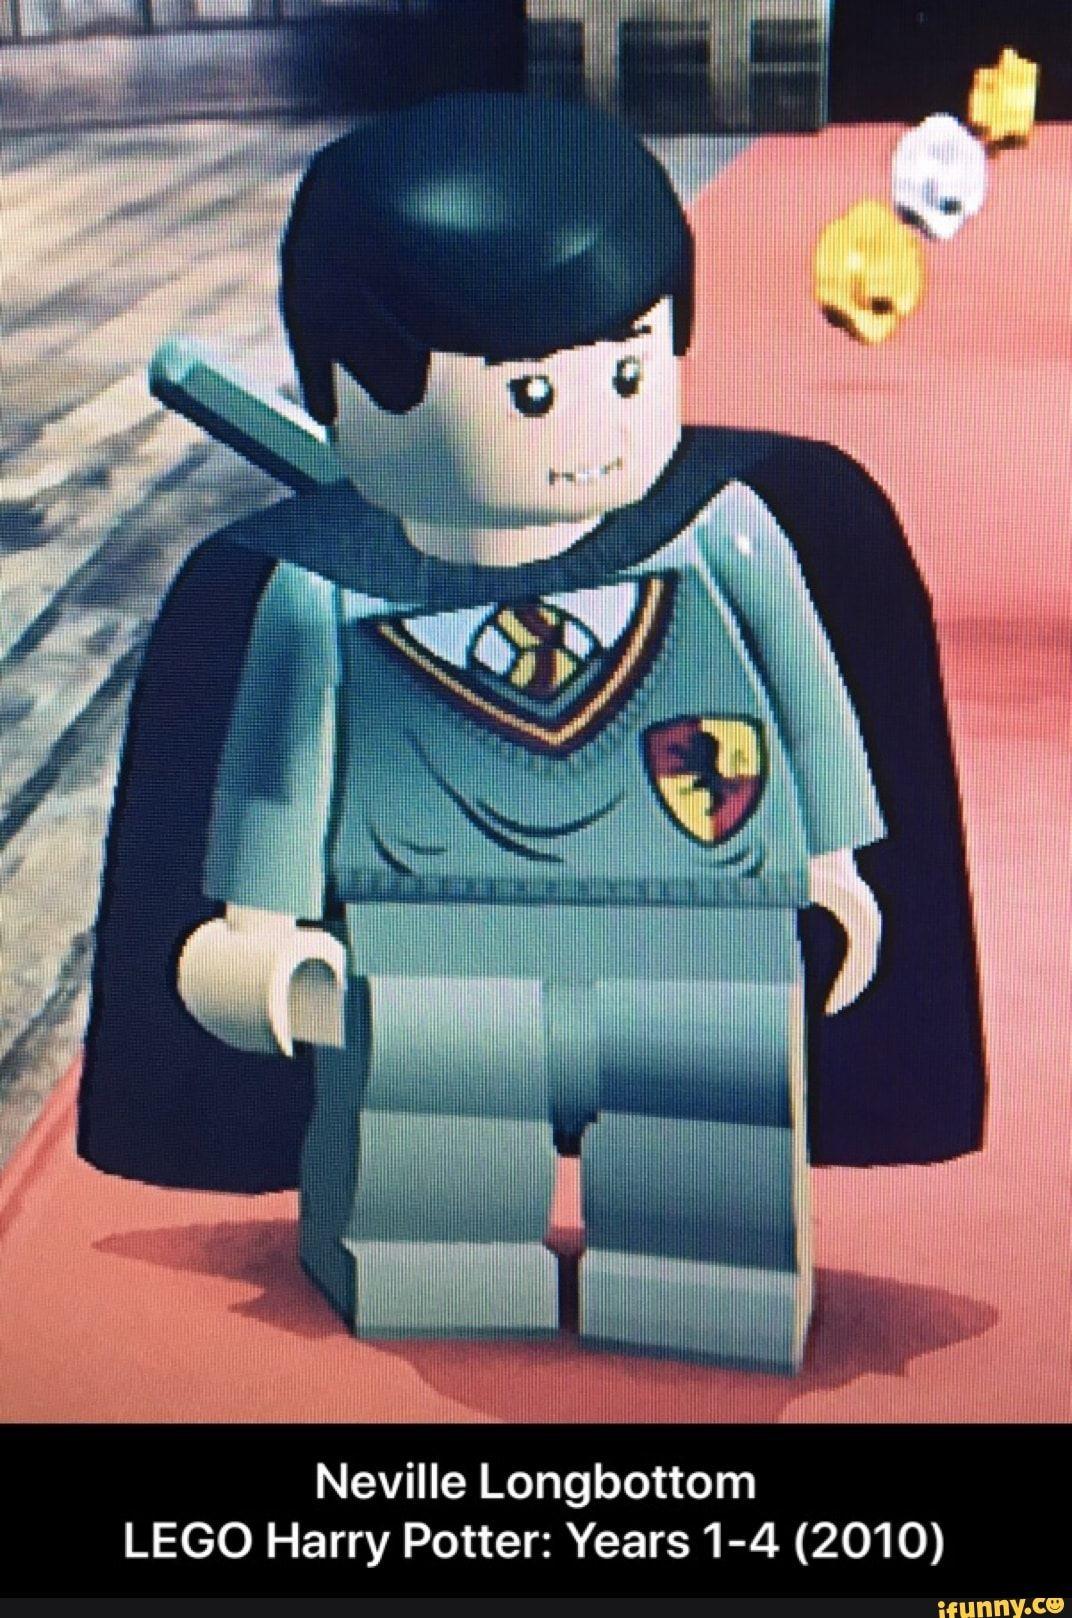 Neville Longbottom Lego Harry Potter Years 1 4 2010 Ifunny Neville Longbottom Lego Harry Potter Memes Hilarious Lego Harry Potter